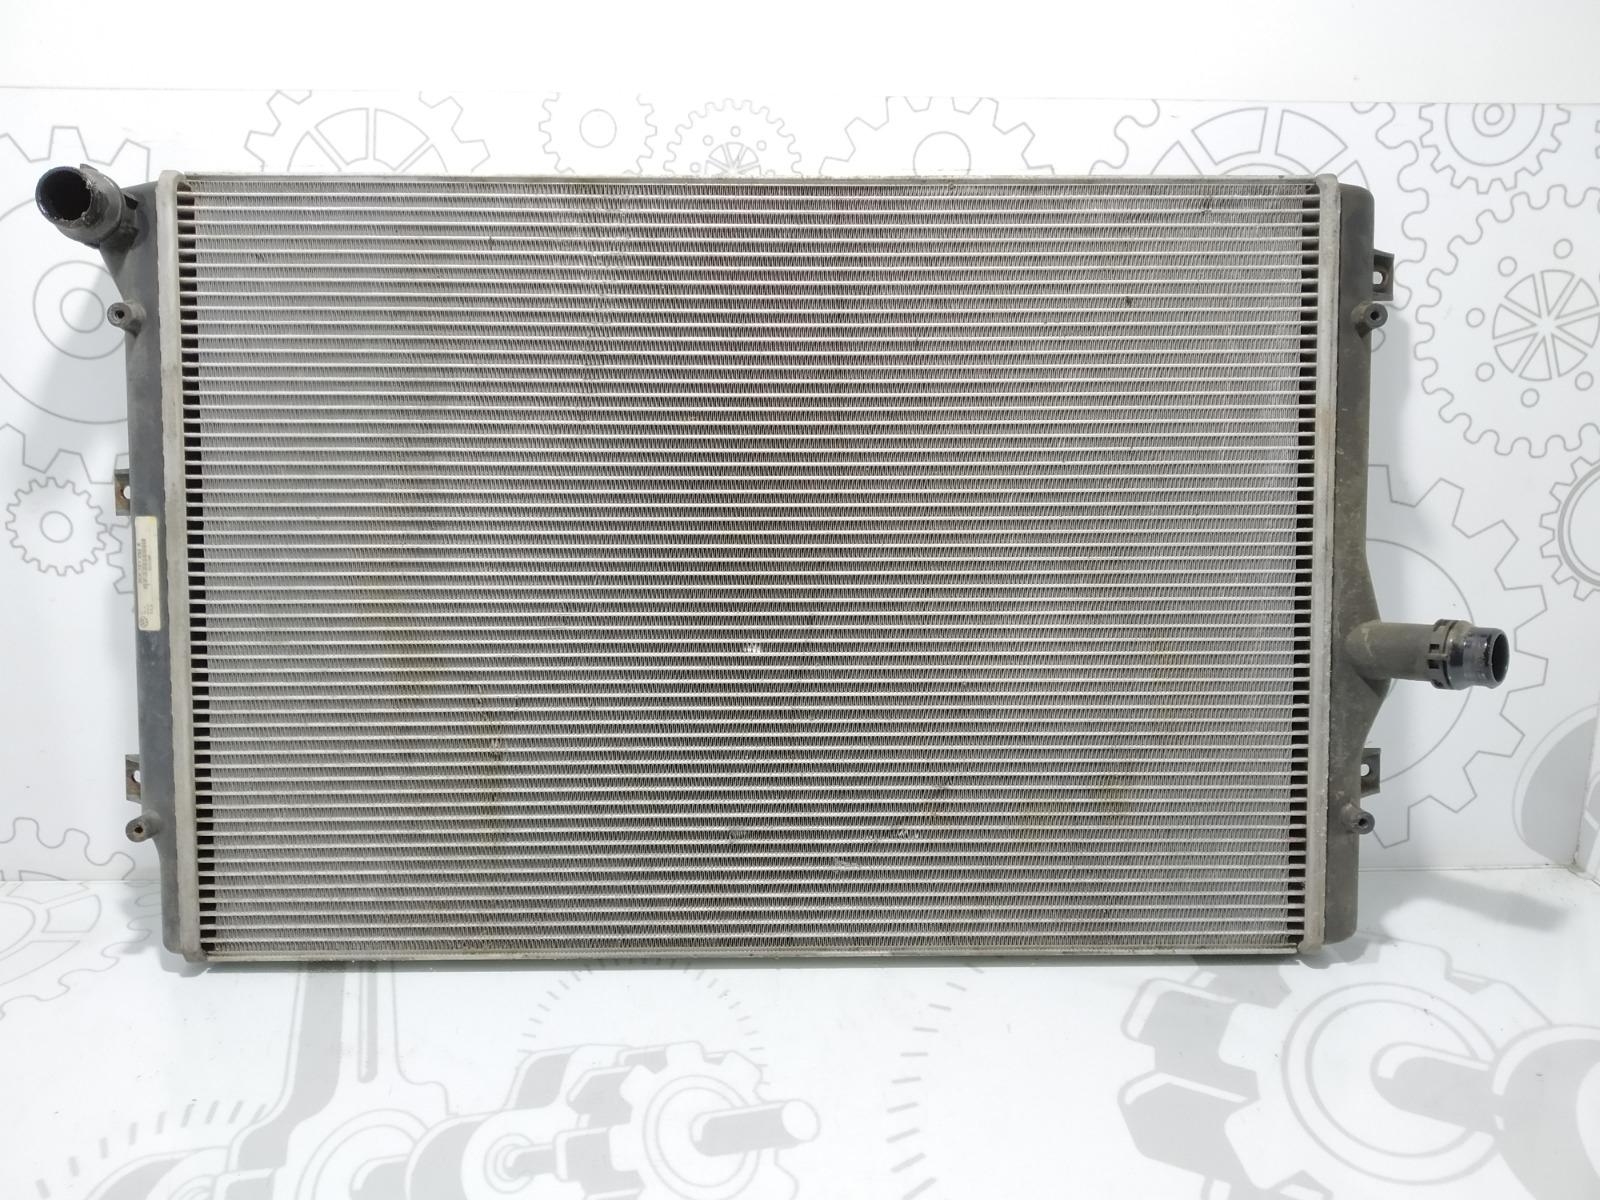 Радиатор (основной) Volkswagen Passat B6 2.0 TDI 2007 (б/у)